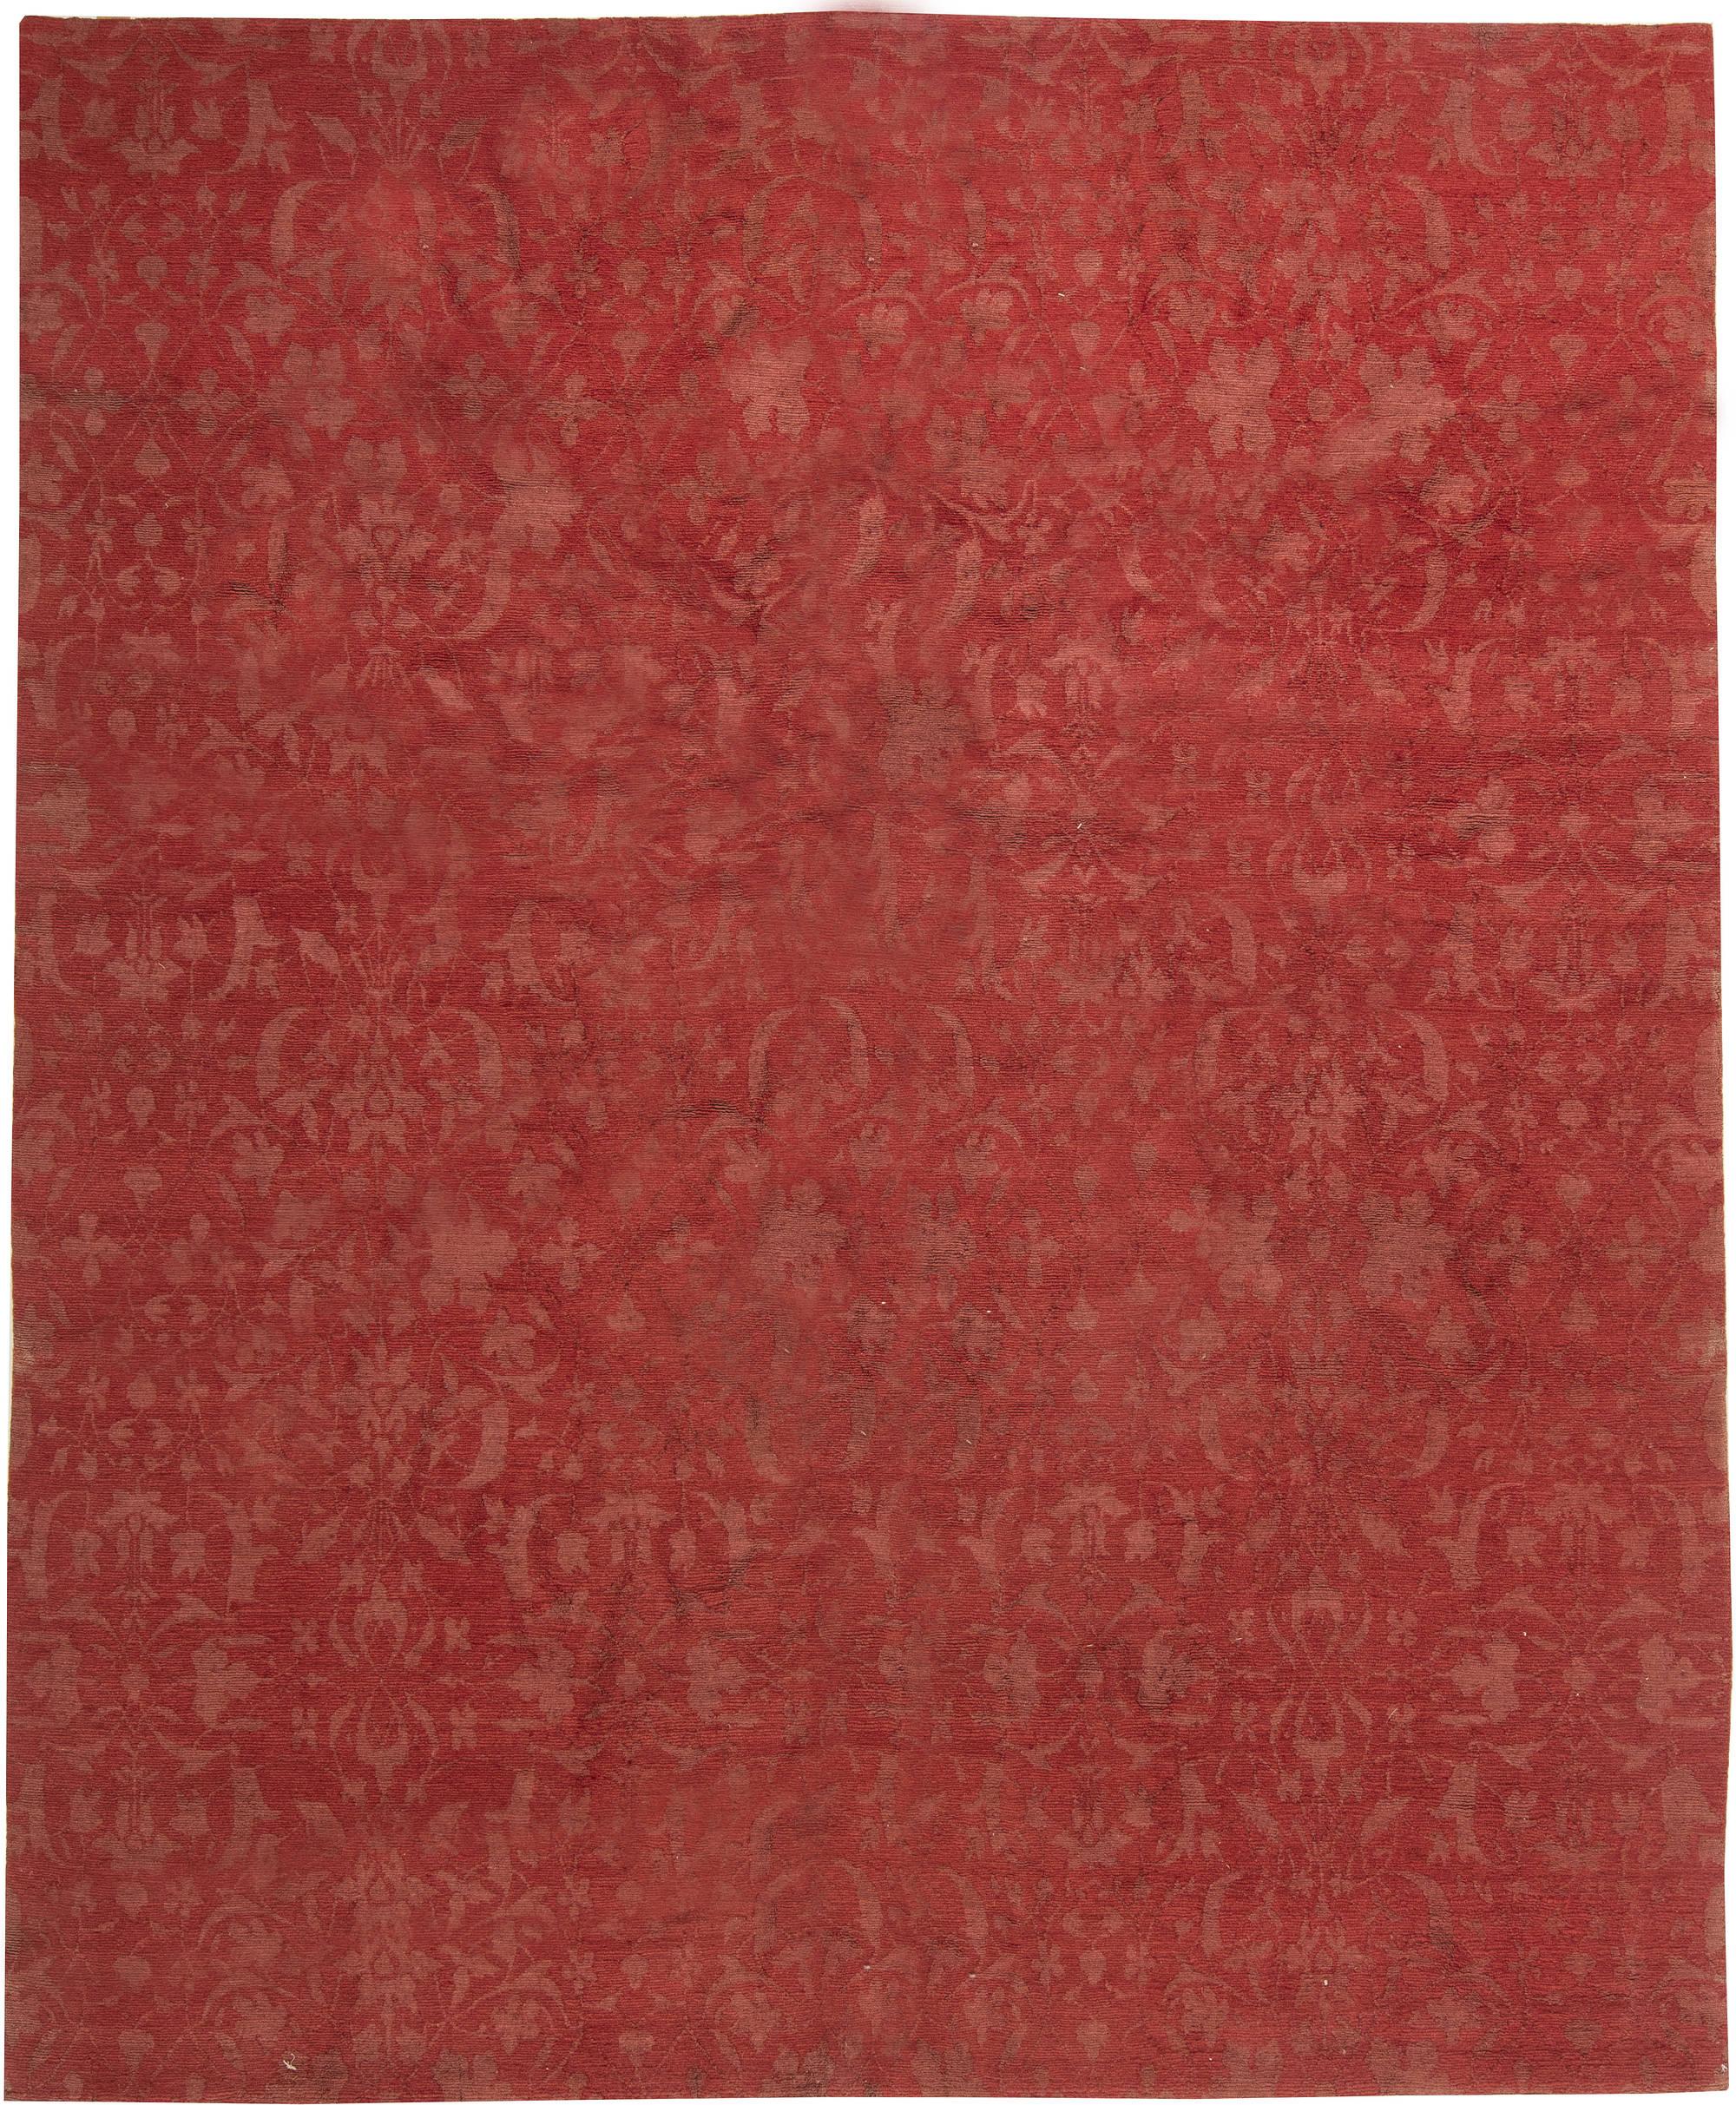 Modern European Inspired Tibetan Rug N11423